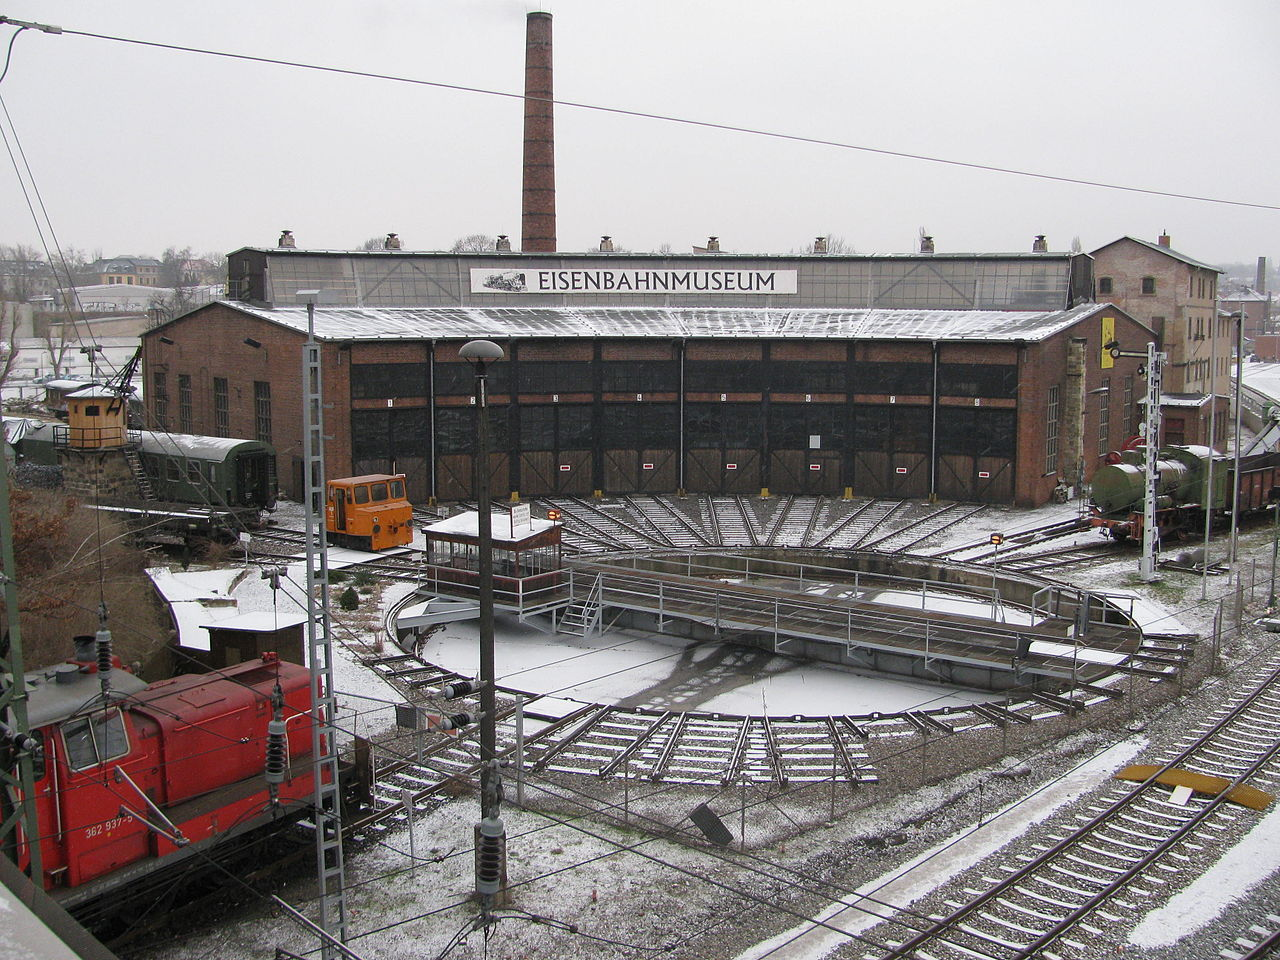 Bild Eisenbahnmuseum Bw Dresden Altstadt